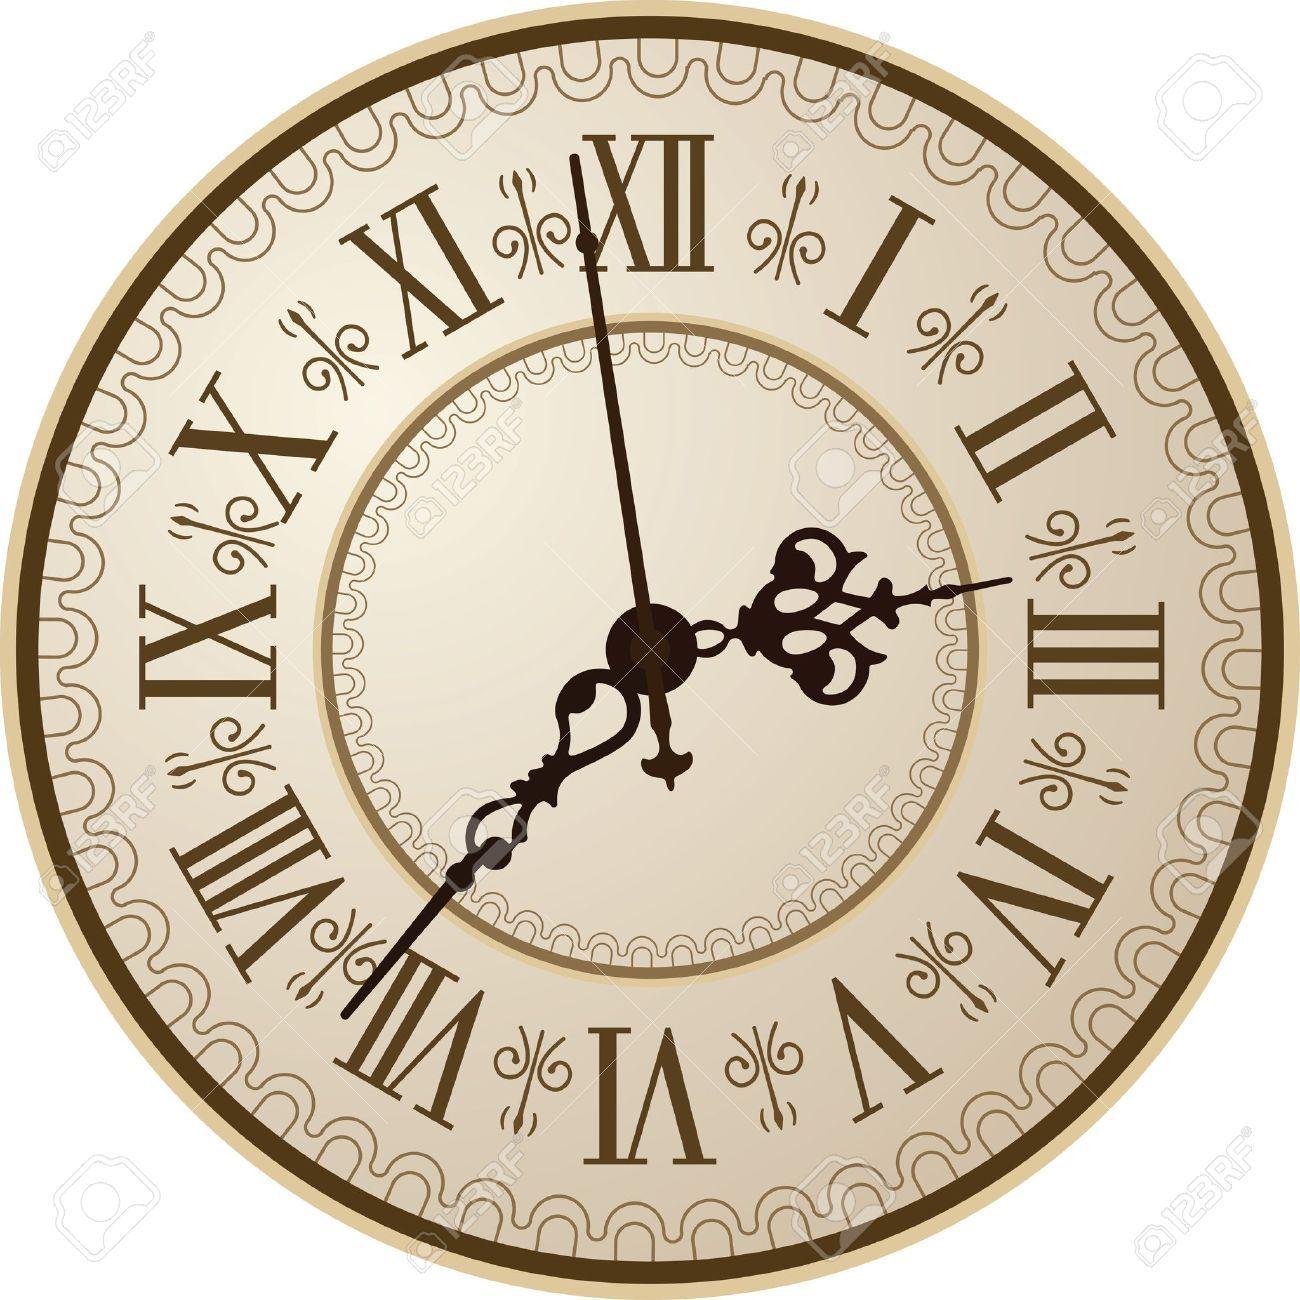 13373732 antique clock vector illustration clock faces pinterest pocket watch and. Black Bedroom Furniture Sets. Home Design Ideas